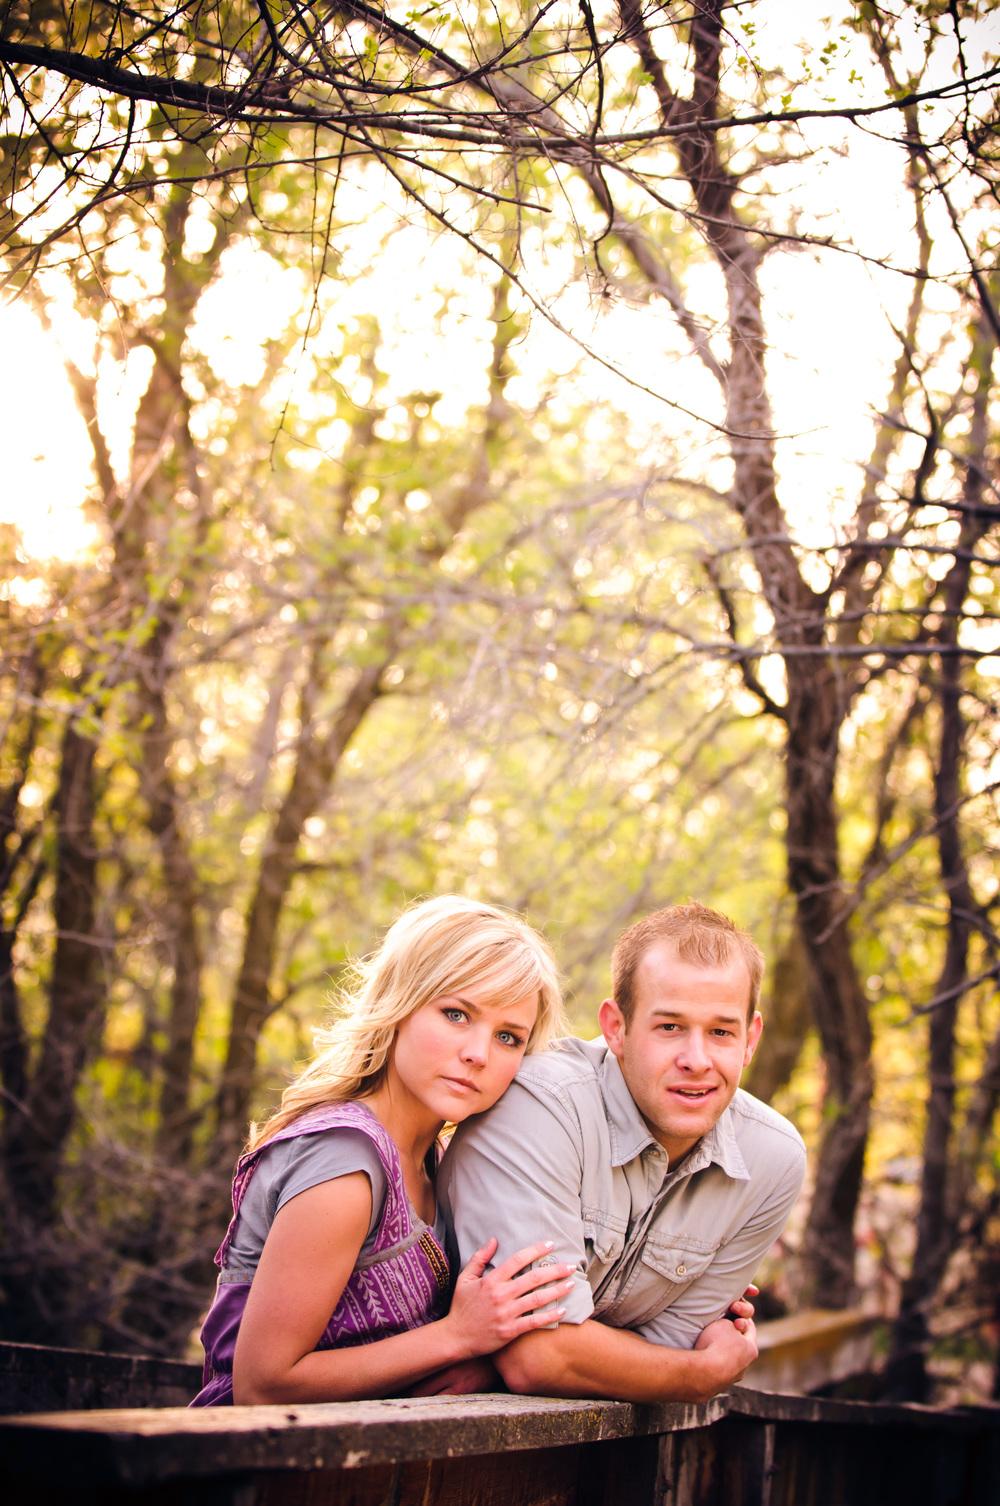 021-Erin&ToddEngage-5.jpg